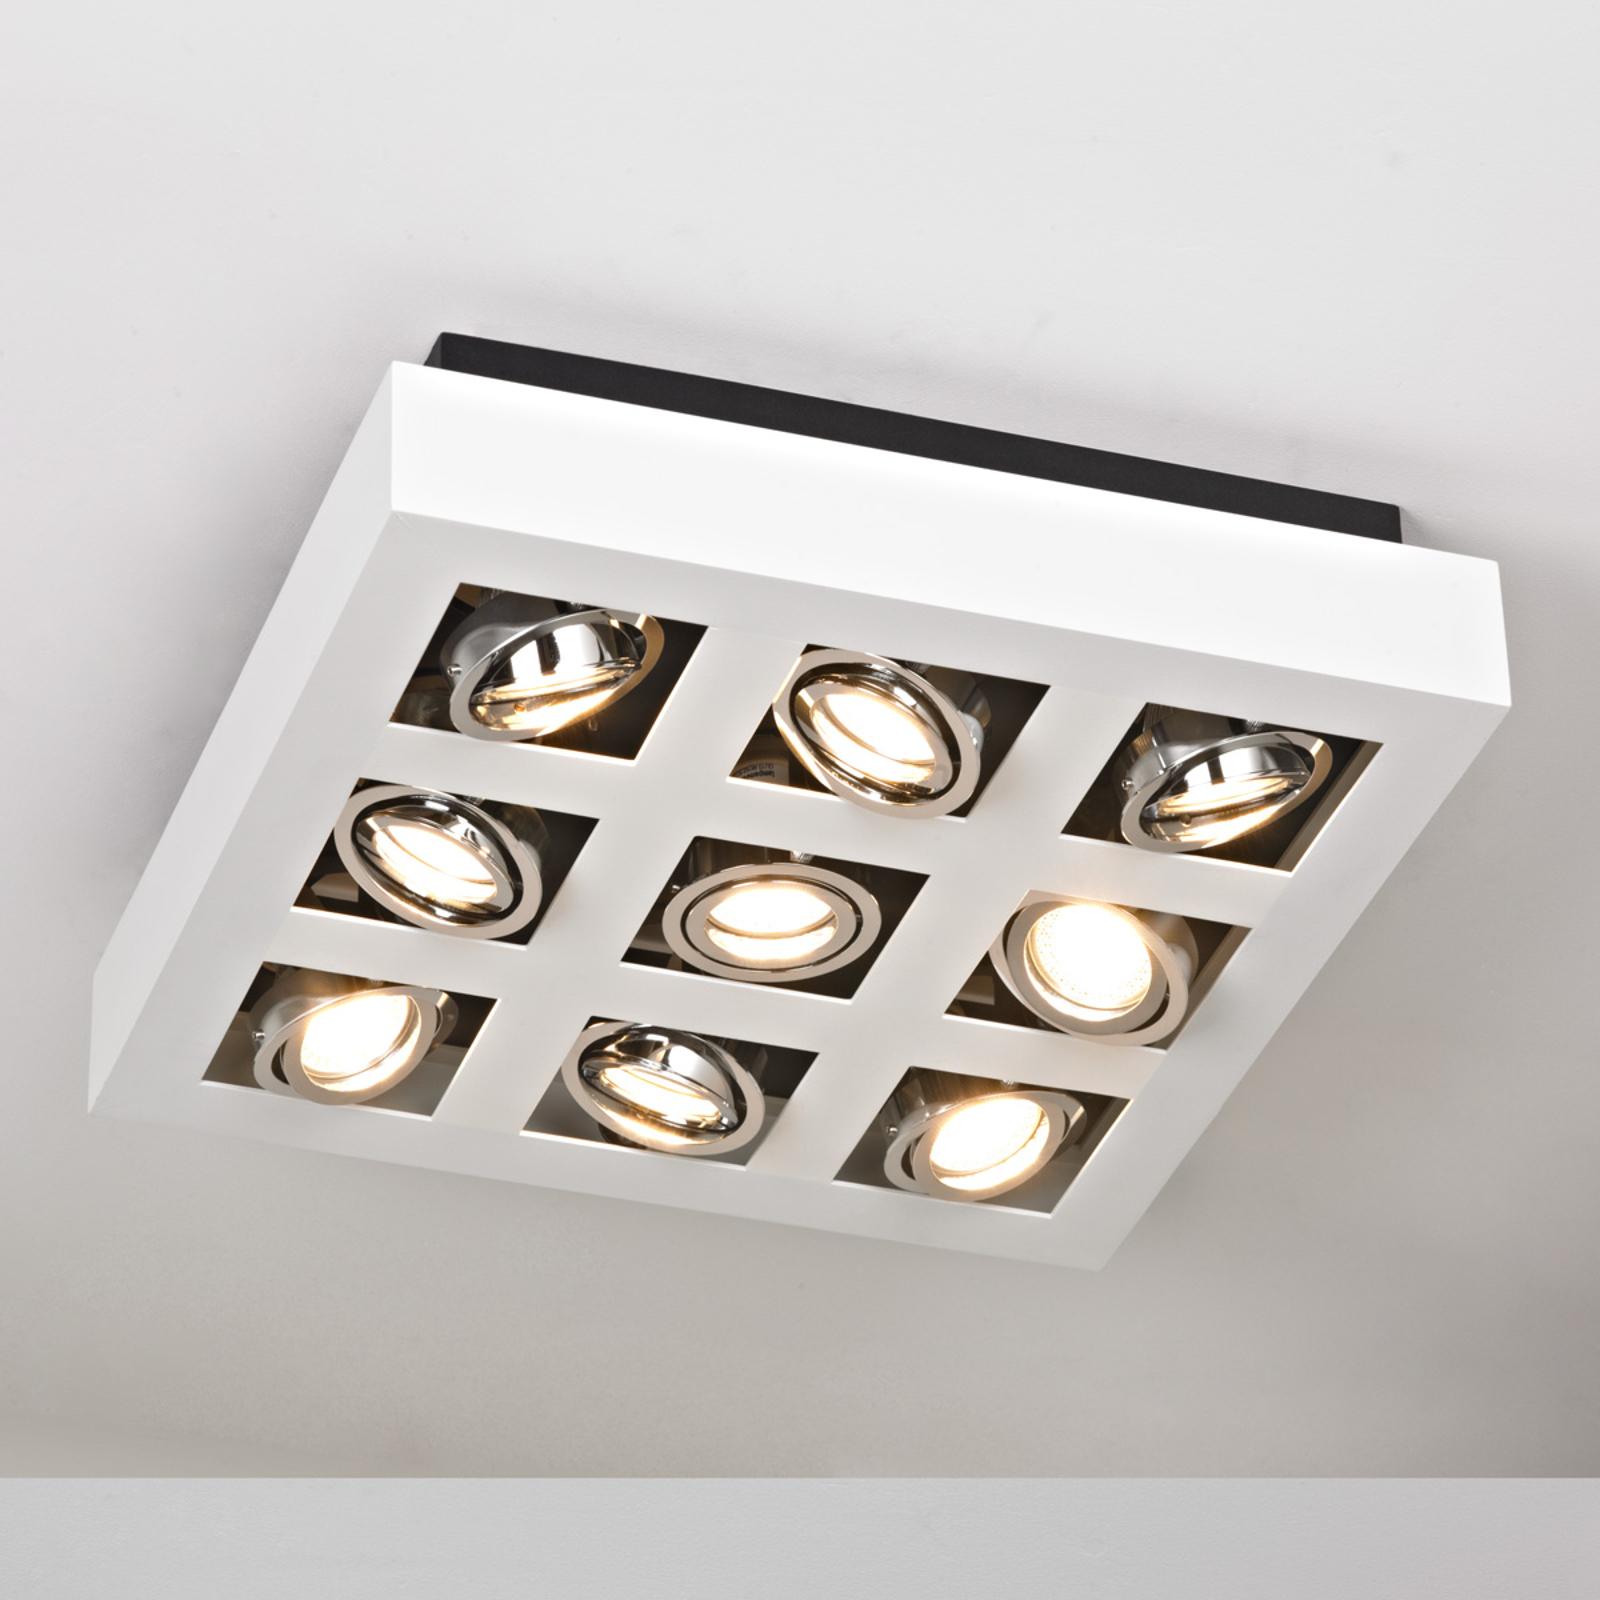 Jasno świecąca lampa sufitowa LED VINCE, 9-pkt.